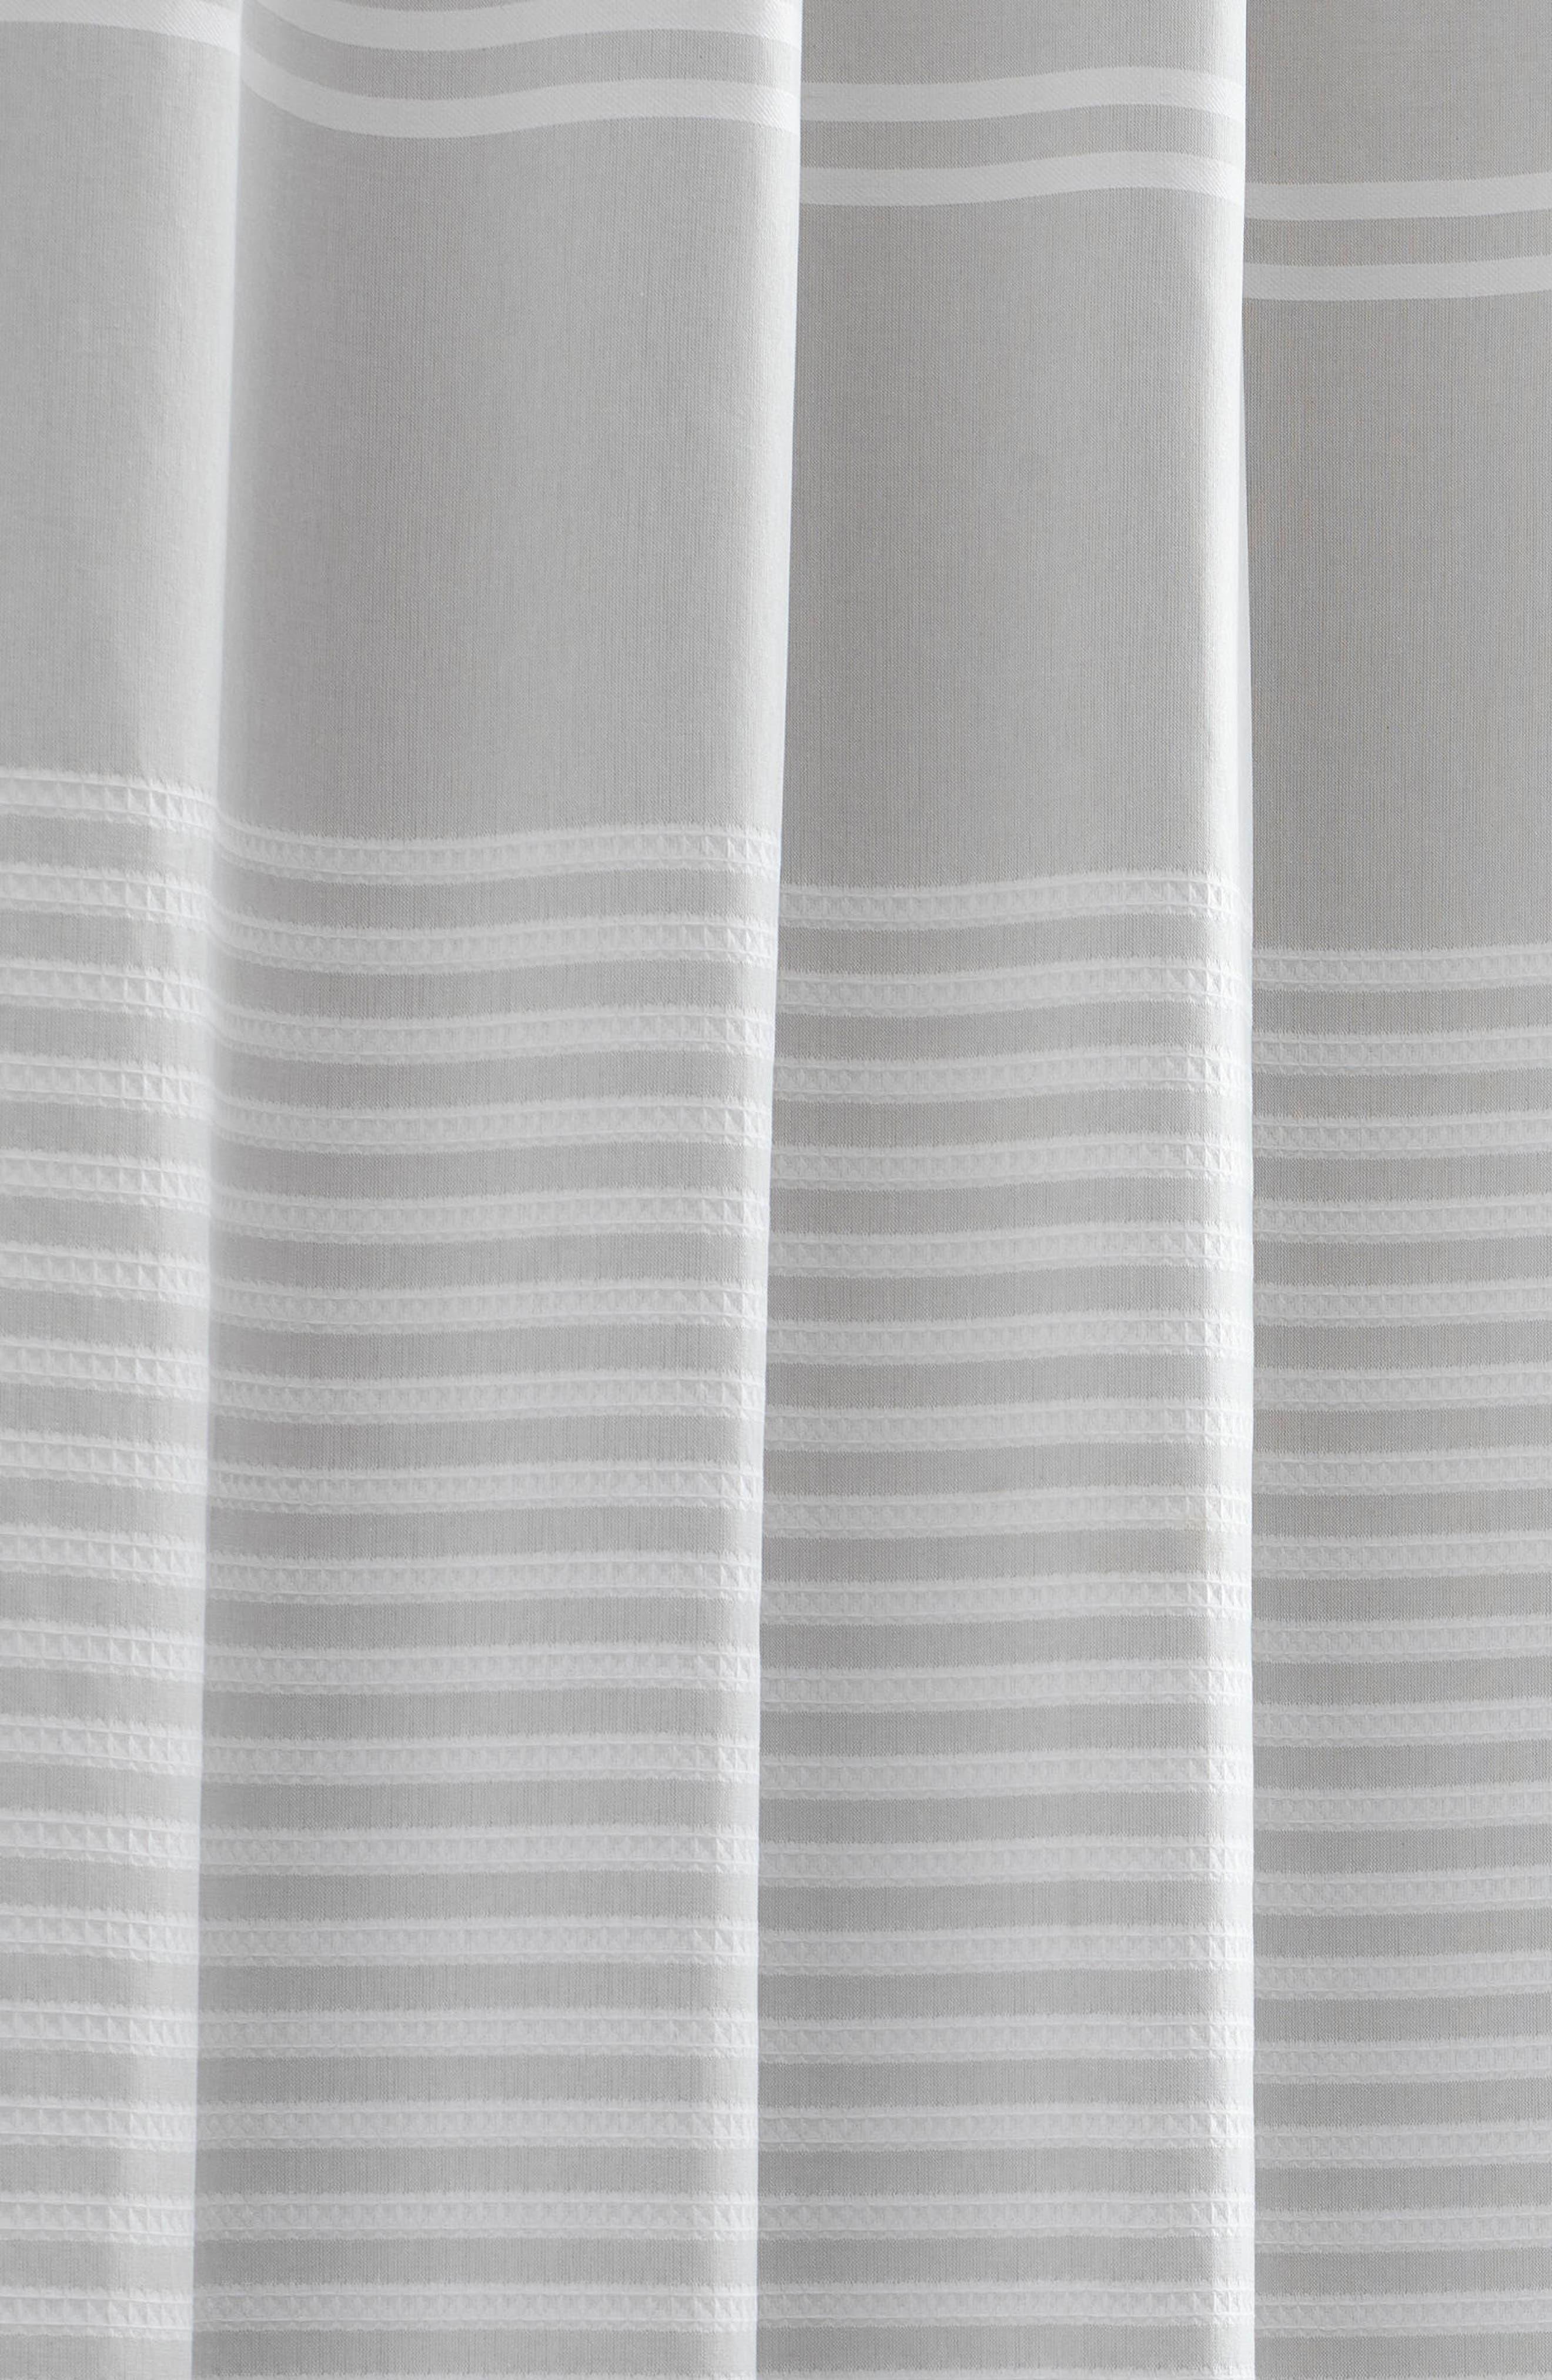 VERA WANG,                             Seersucker Stripe Shower Curtain,                             Alternate thumbnail 3, color,                             AQUARMARINE/ WHITE